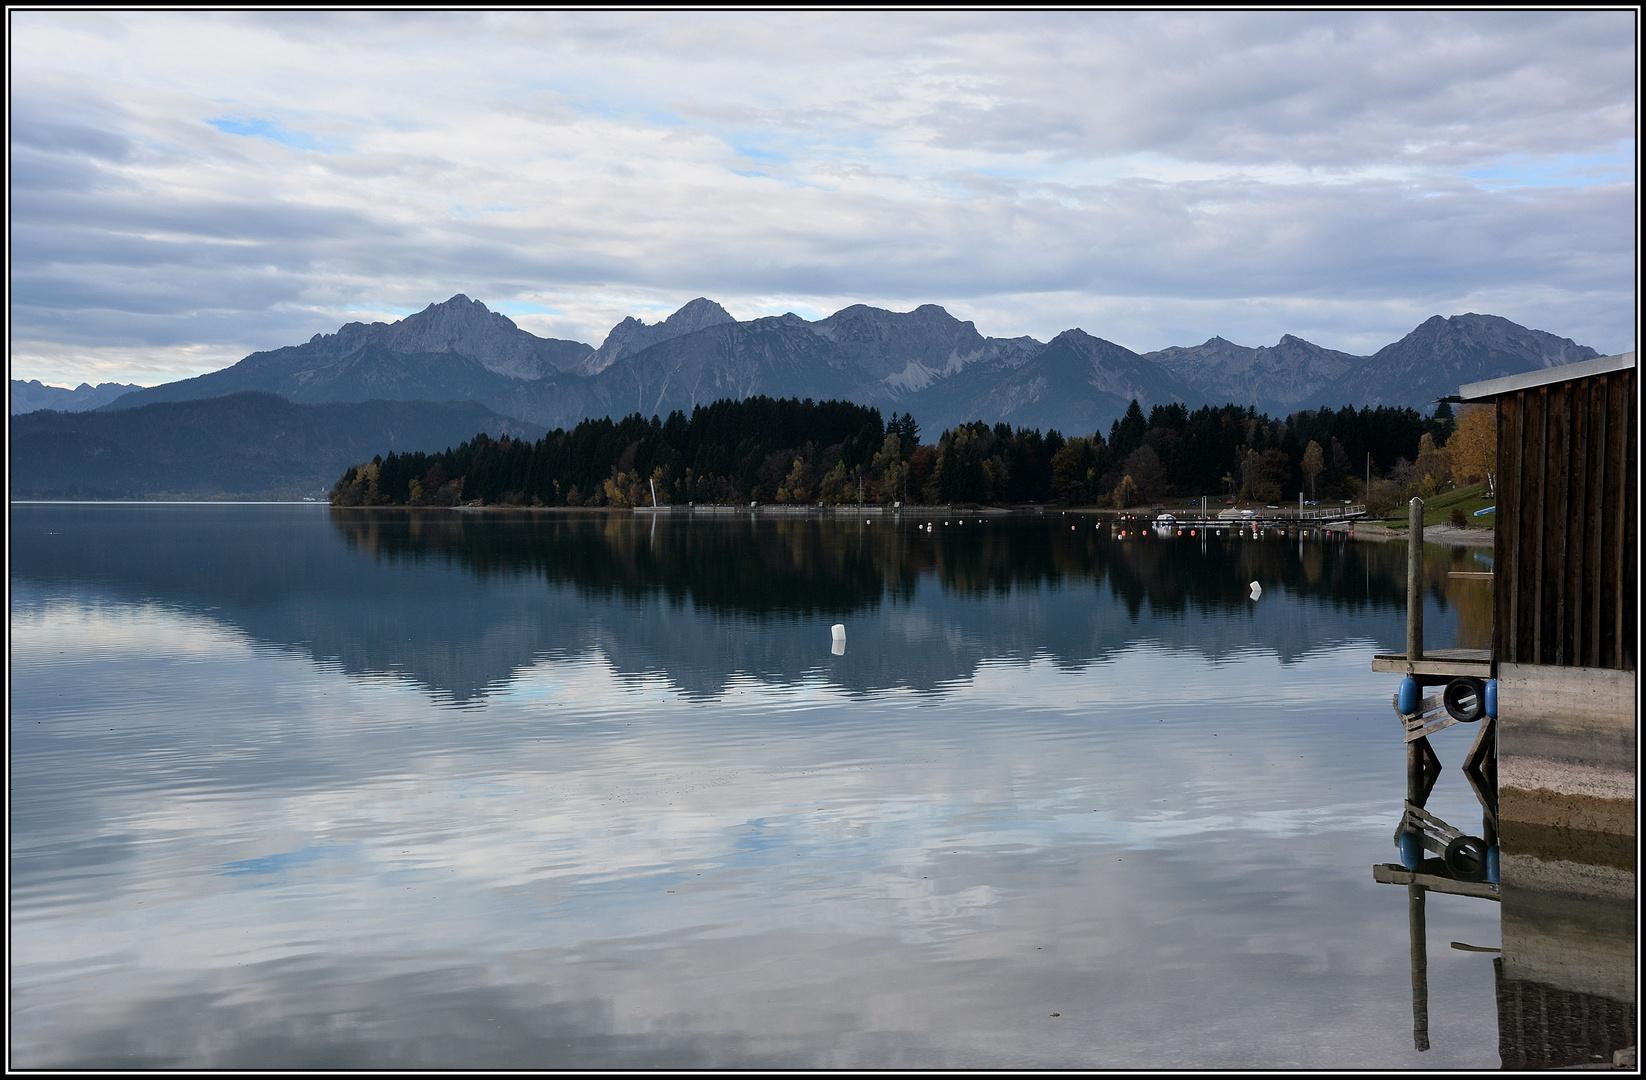 Forggensee bei Dietringen, Allgäu, Ostallgäu ( 02 )